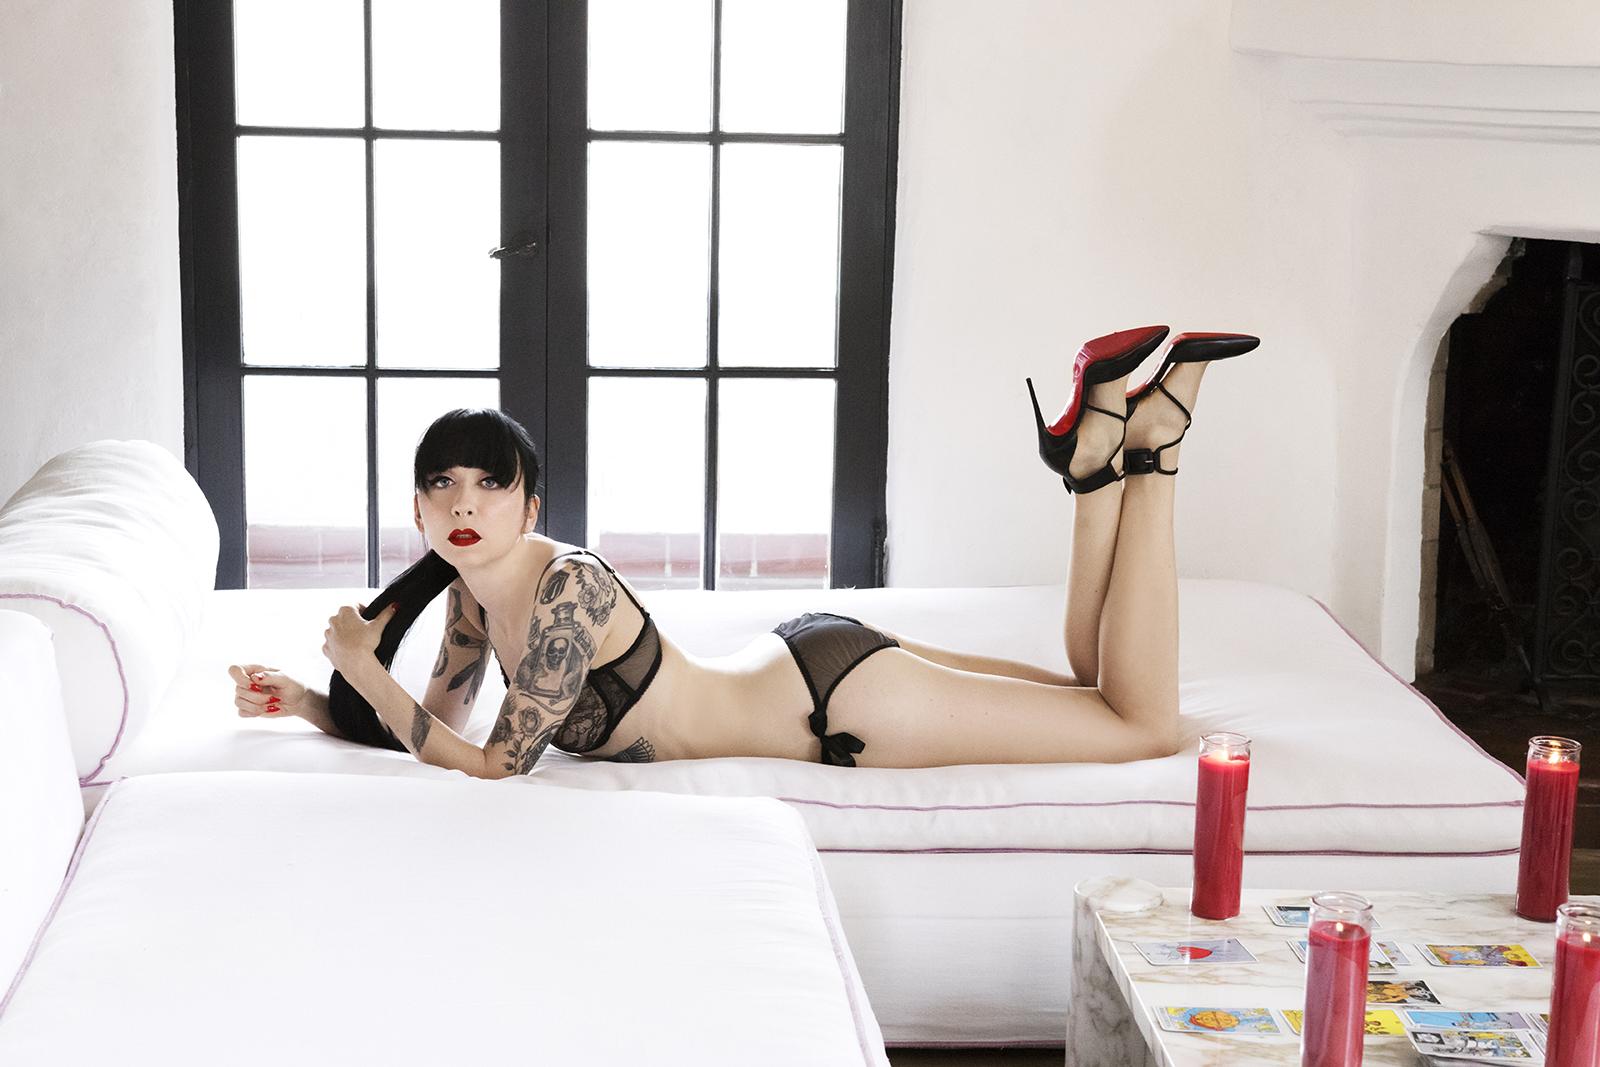 Mistress_Ramona_Ryder_NYC_Chicago_Punk_Goth_Tattooed_Escort_03.jpg